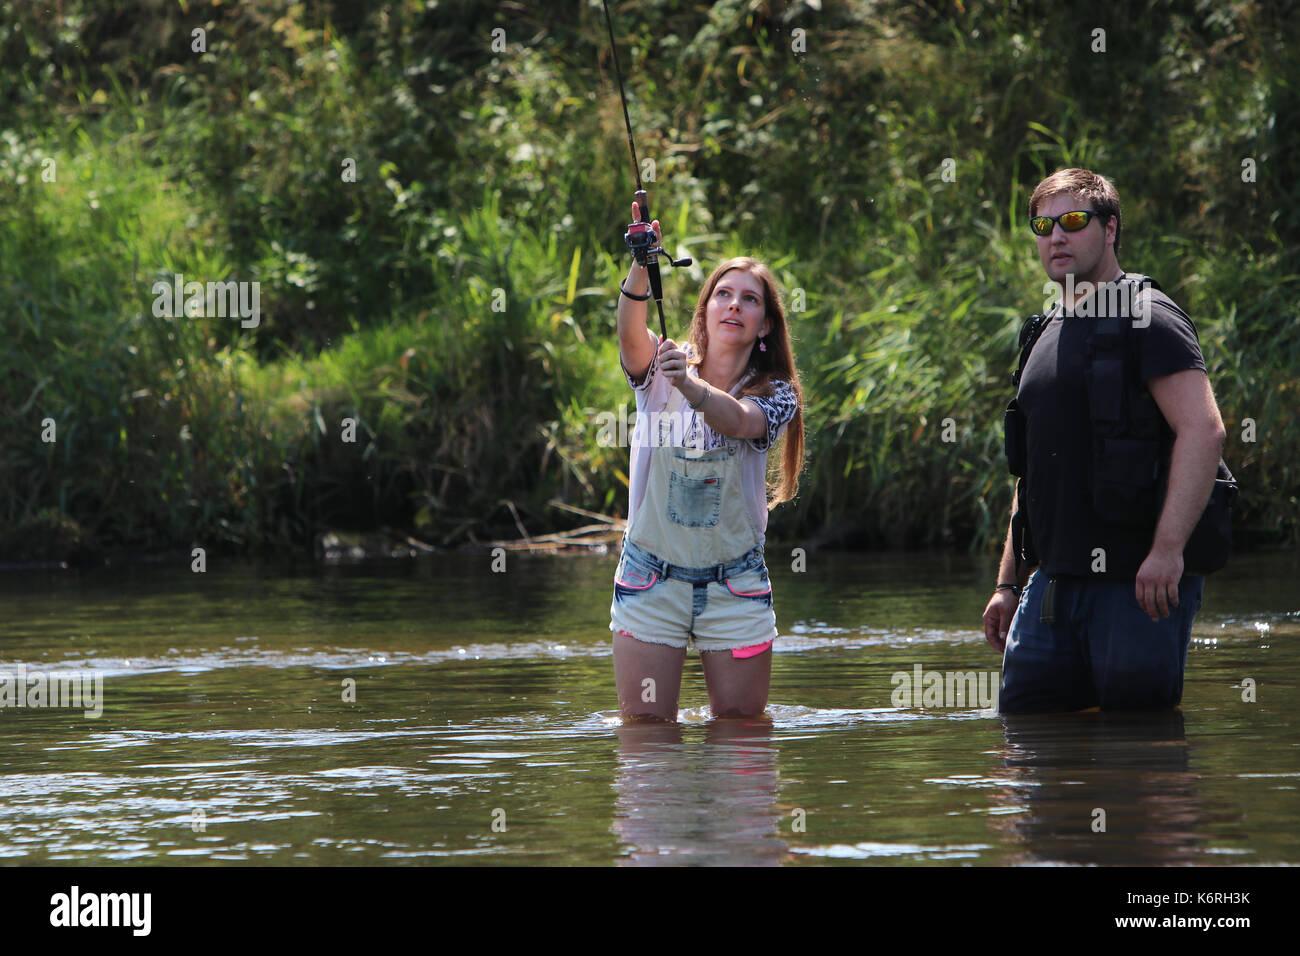 Girl Fly Fishing Stock Photos   Girl Fly Fishing Stock Images - Alamy 272e85e2ca86